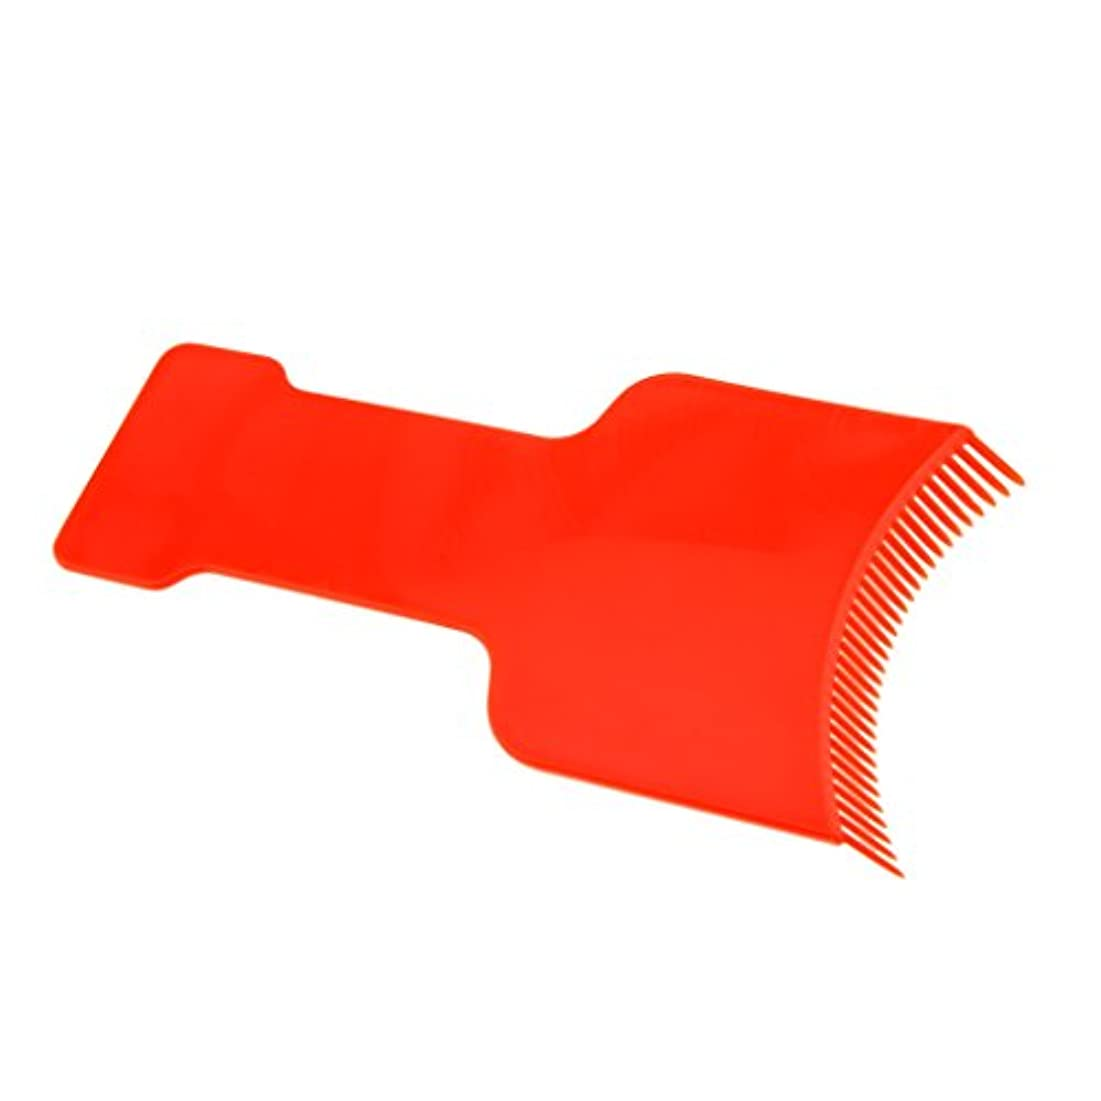 Blesiya ヘアカラーボード サロン ヘアカラー ボード ヘアカラーティントプレート 理髪 美容院